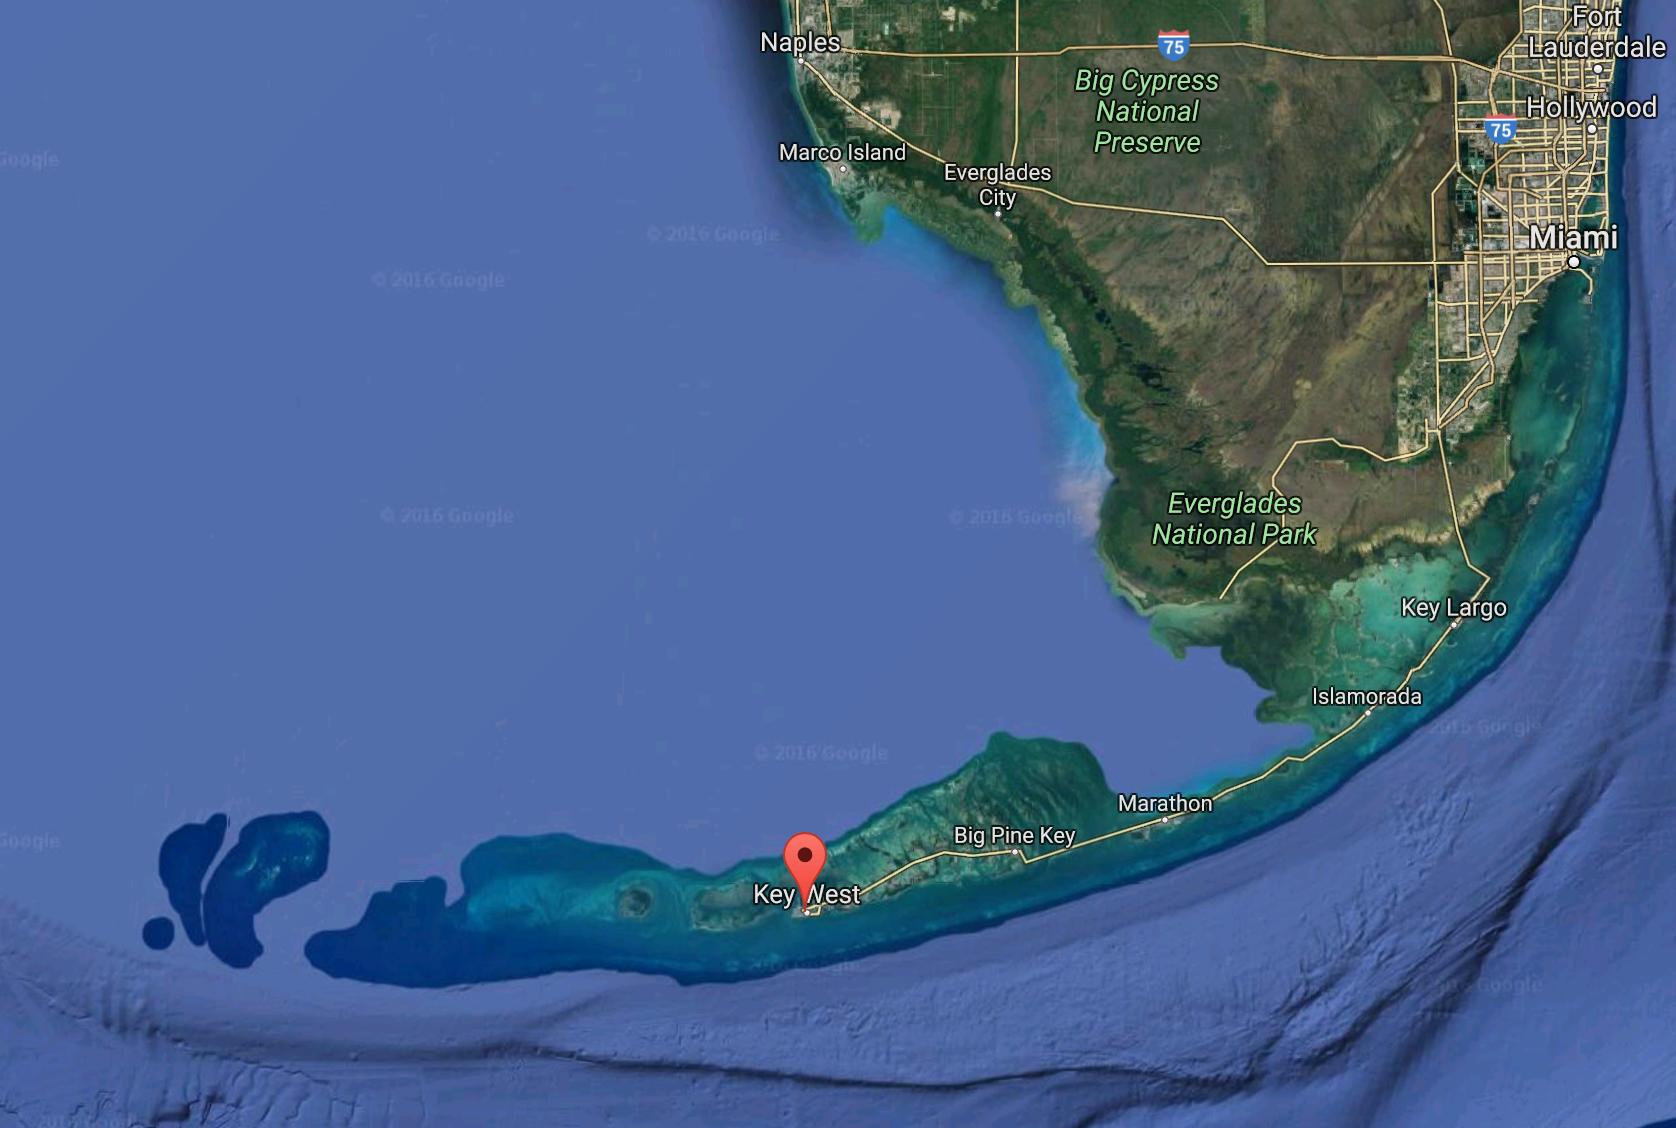 Florida Keys e a estrada Overseas Highway | imagem: Google Earth